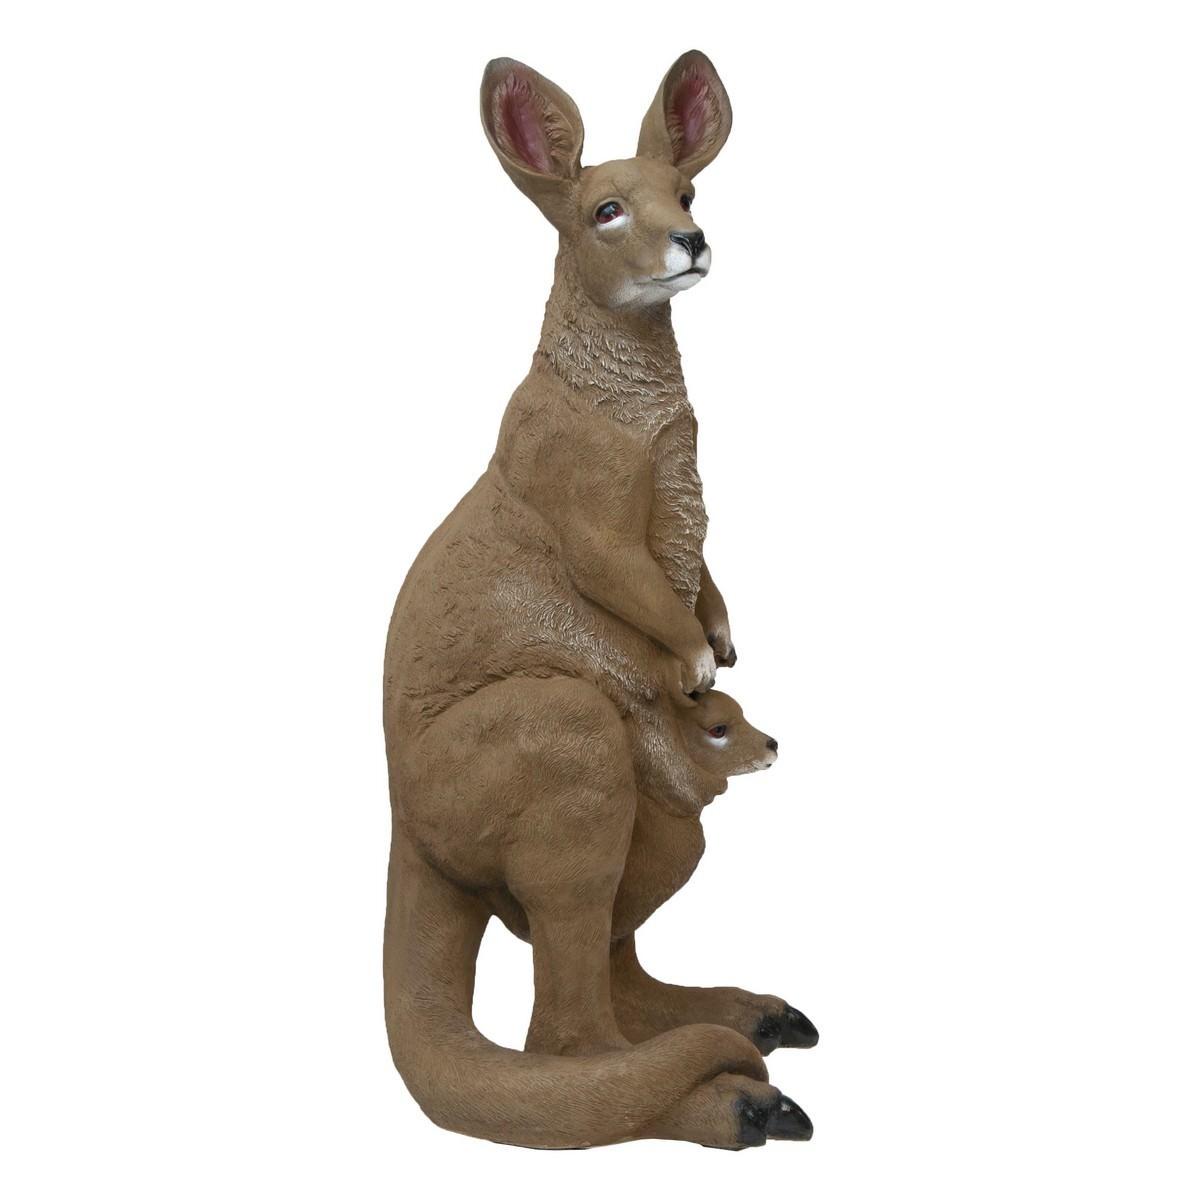 Majestic Kangaroo Polyresin Figurine Decor